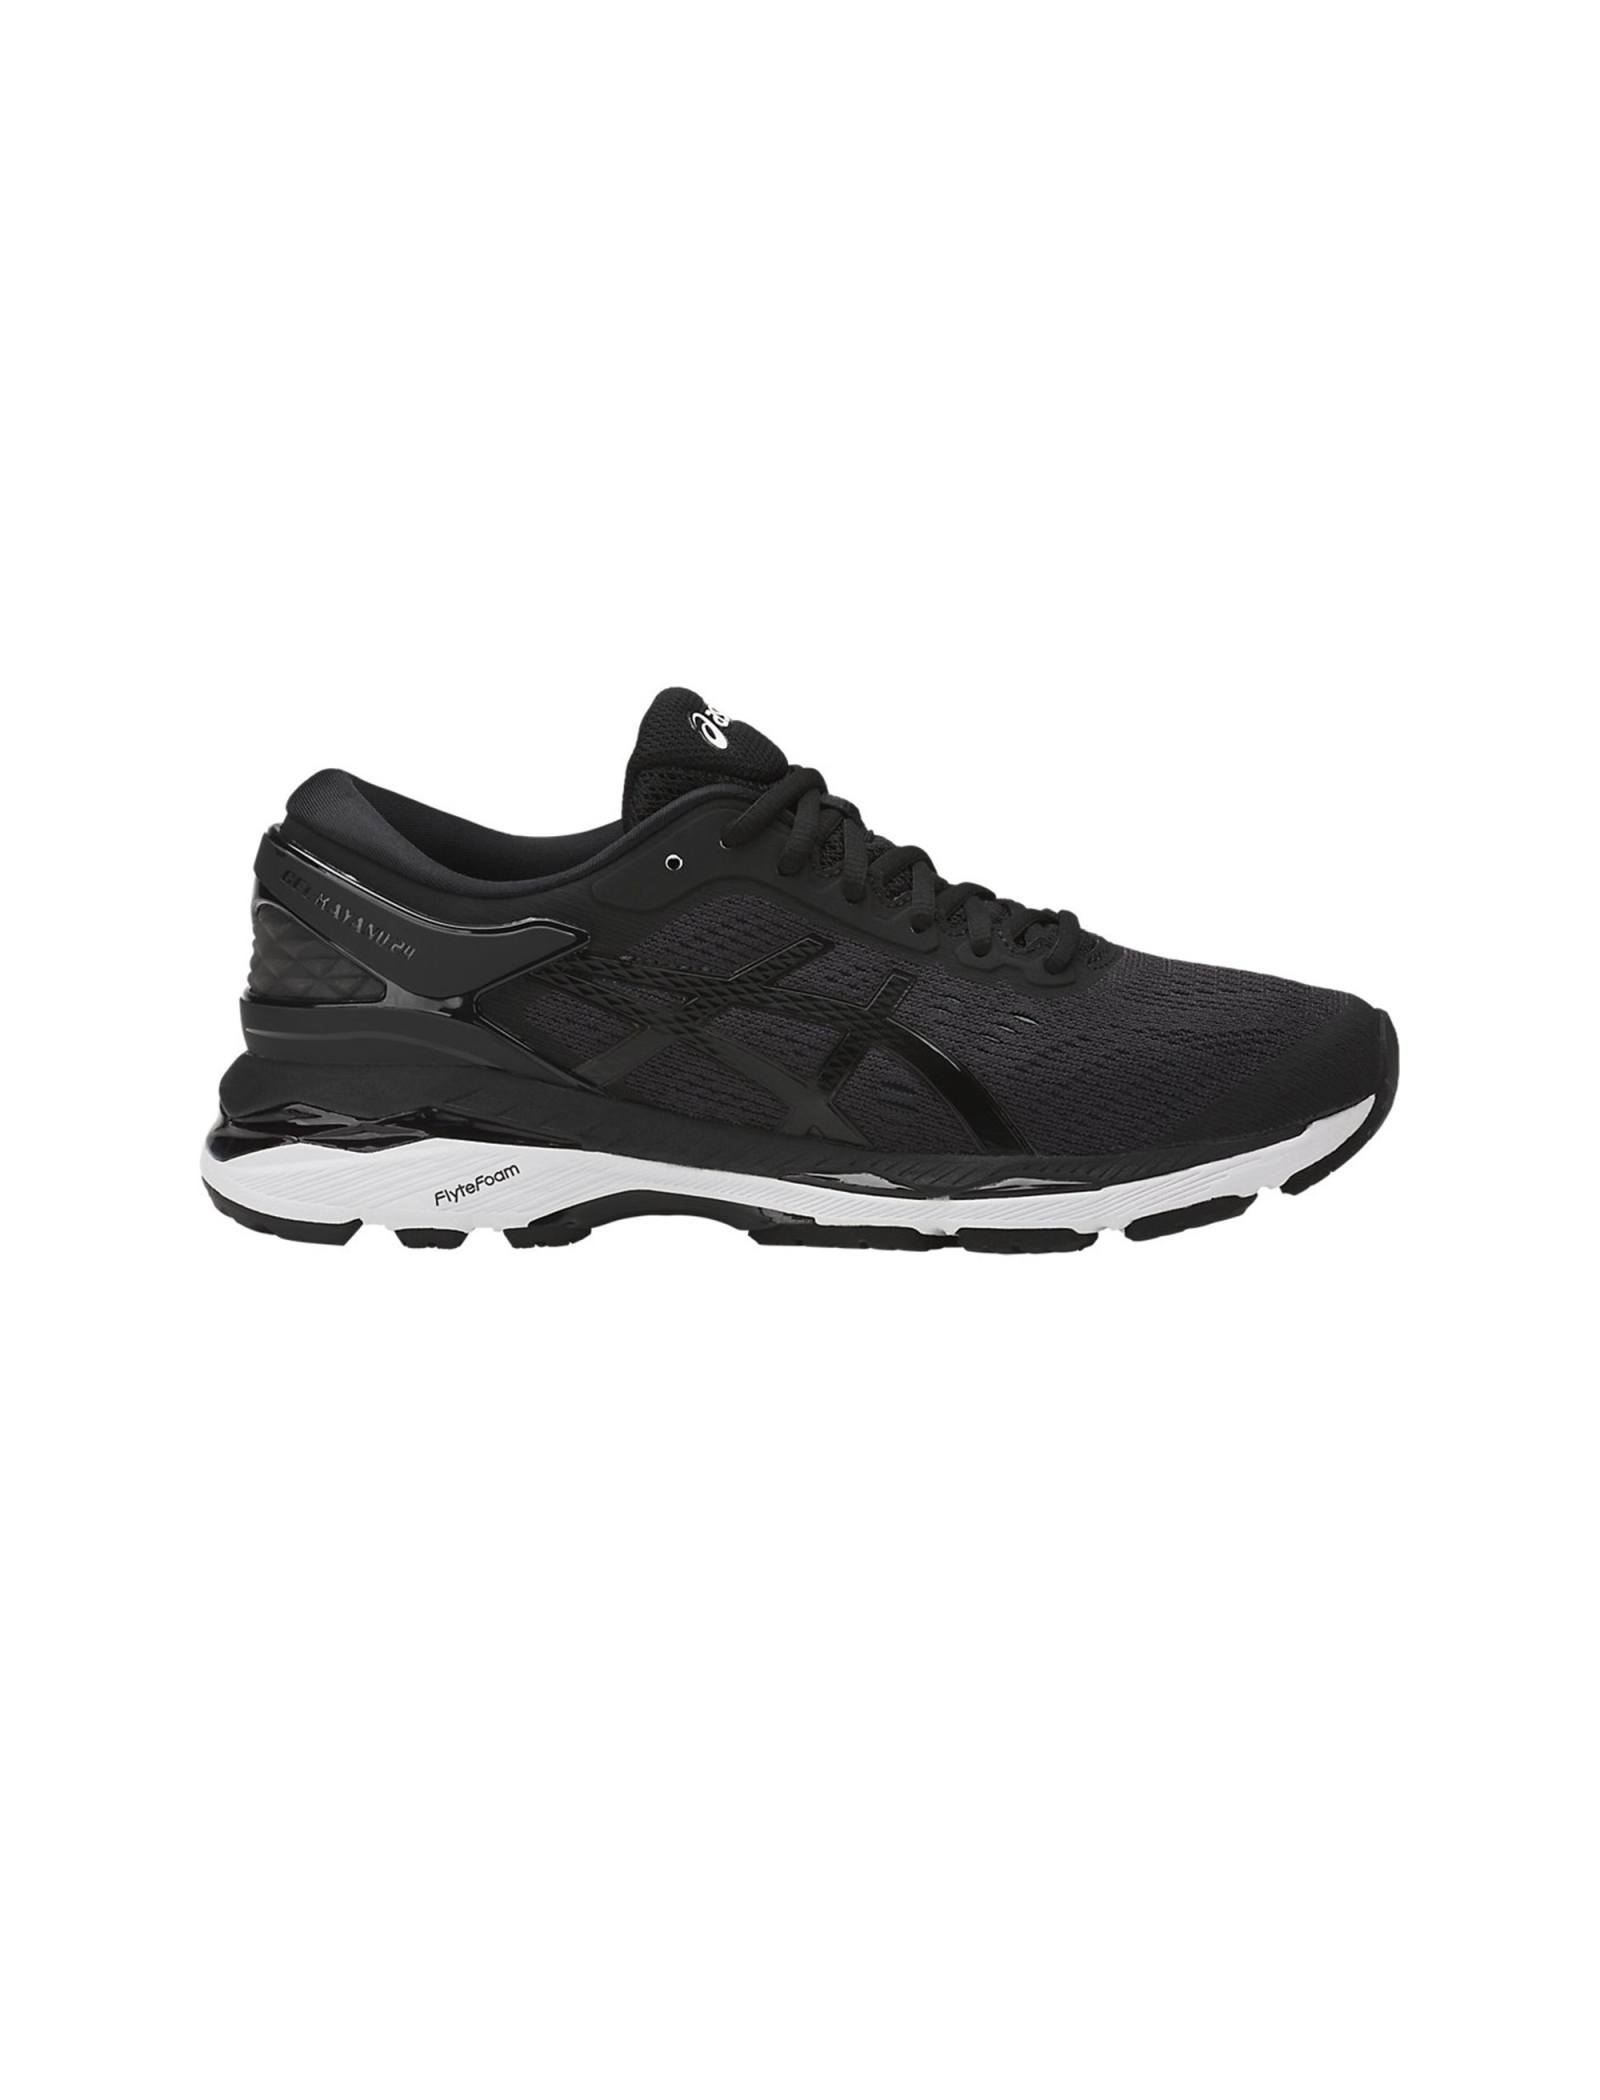 کفش دویدن بندی زنانه GEL-KAYANO 24 - اسیکس - مشکي - 1